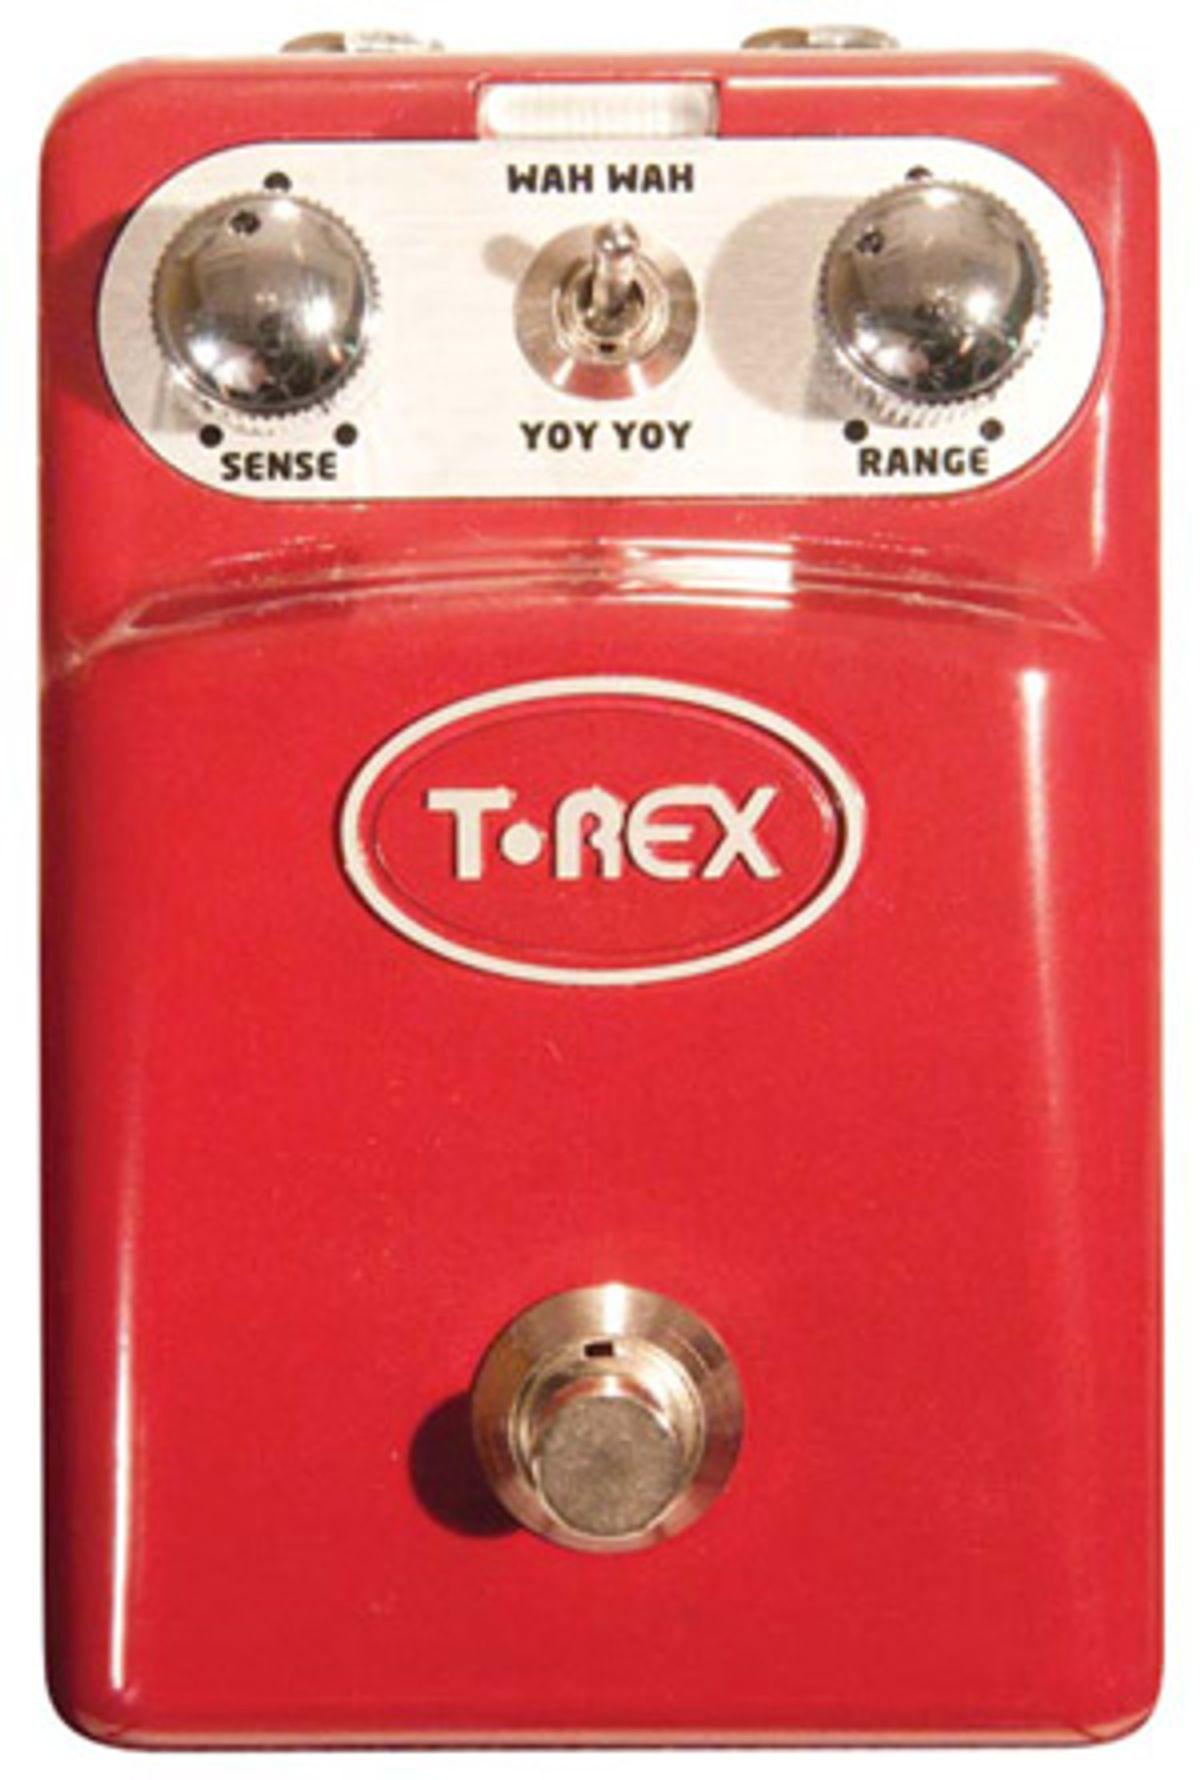 T-Rex Tonebug Sensewah Pedal Review